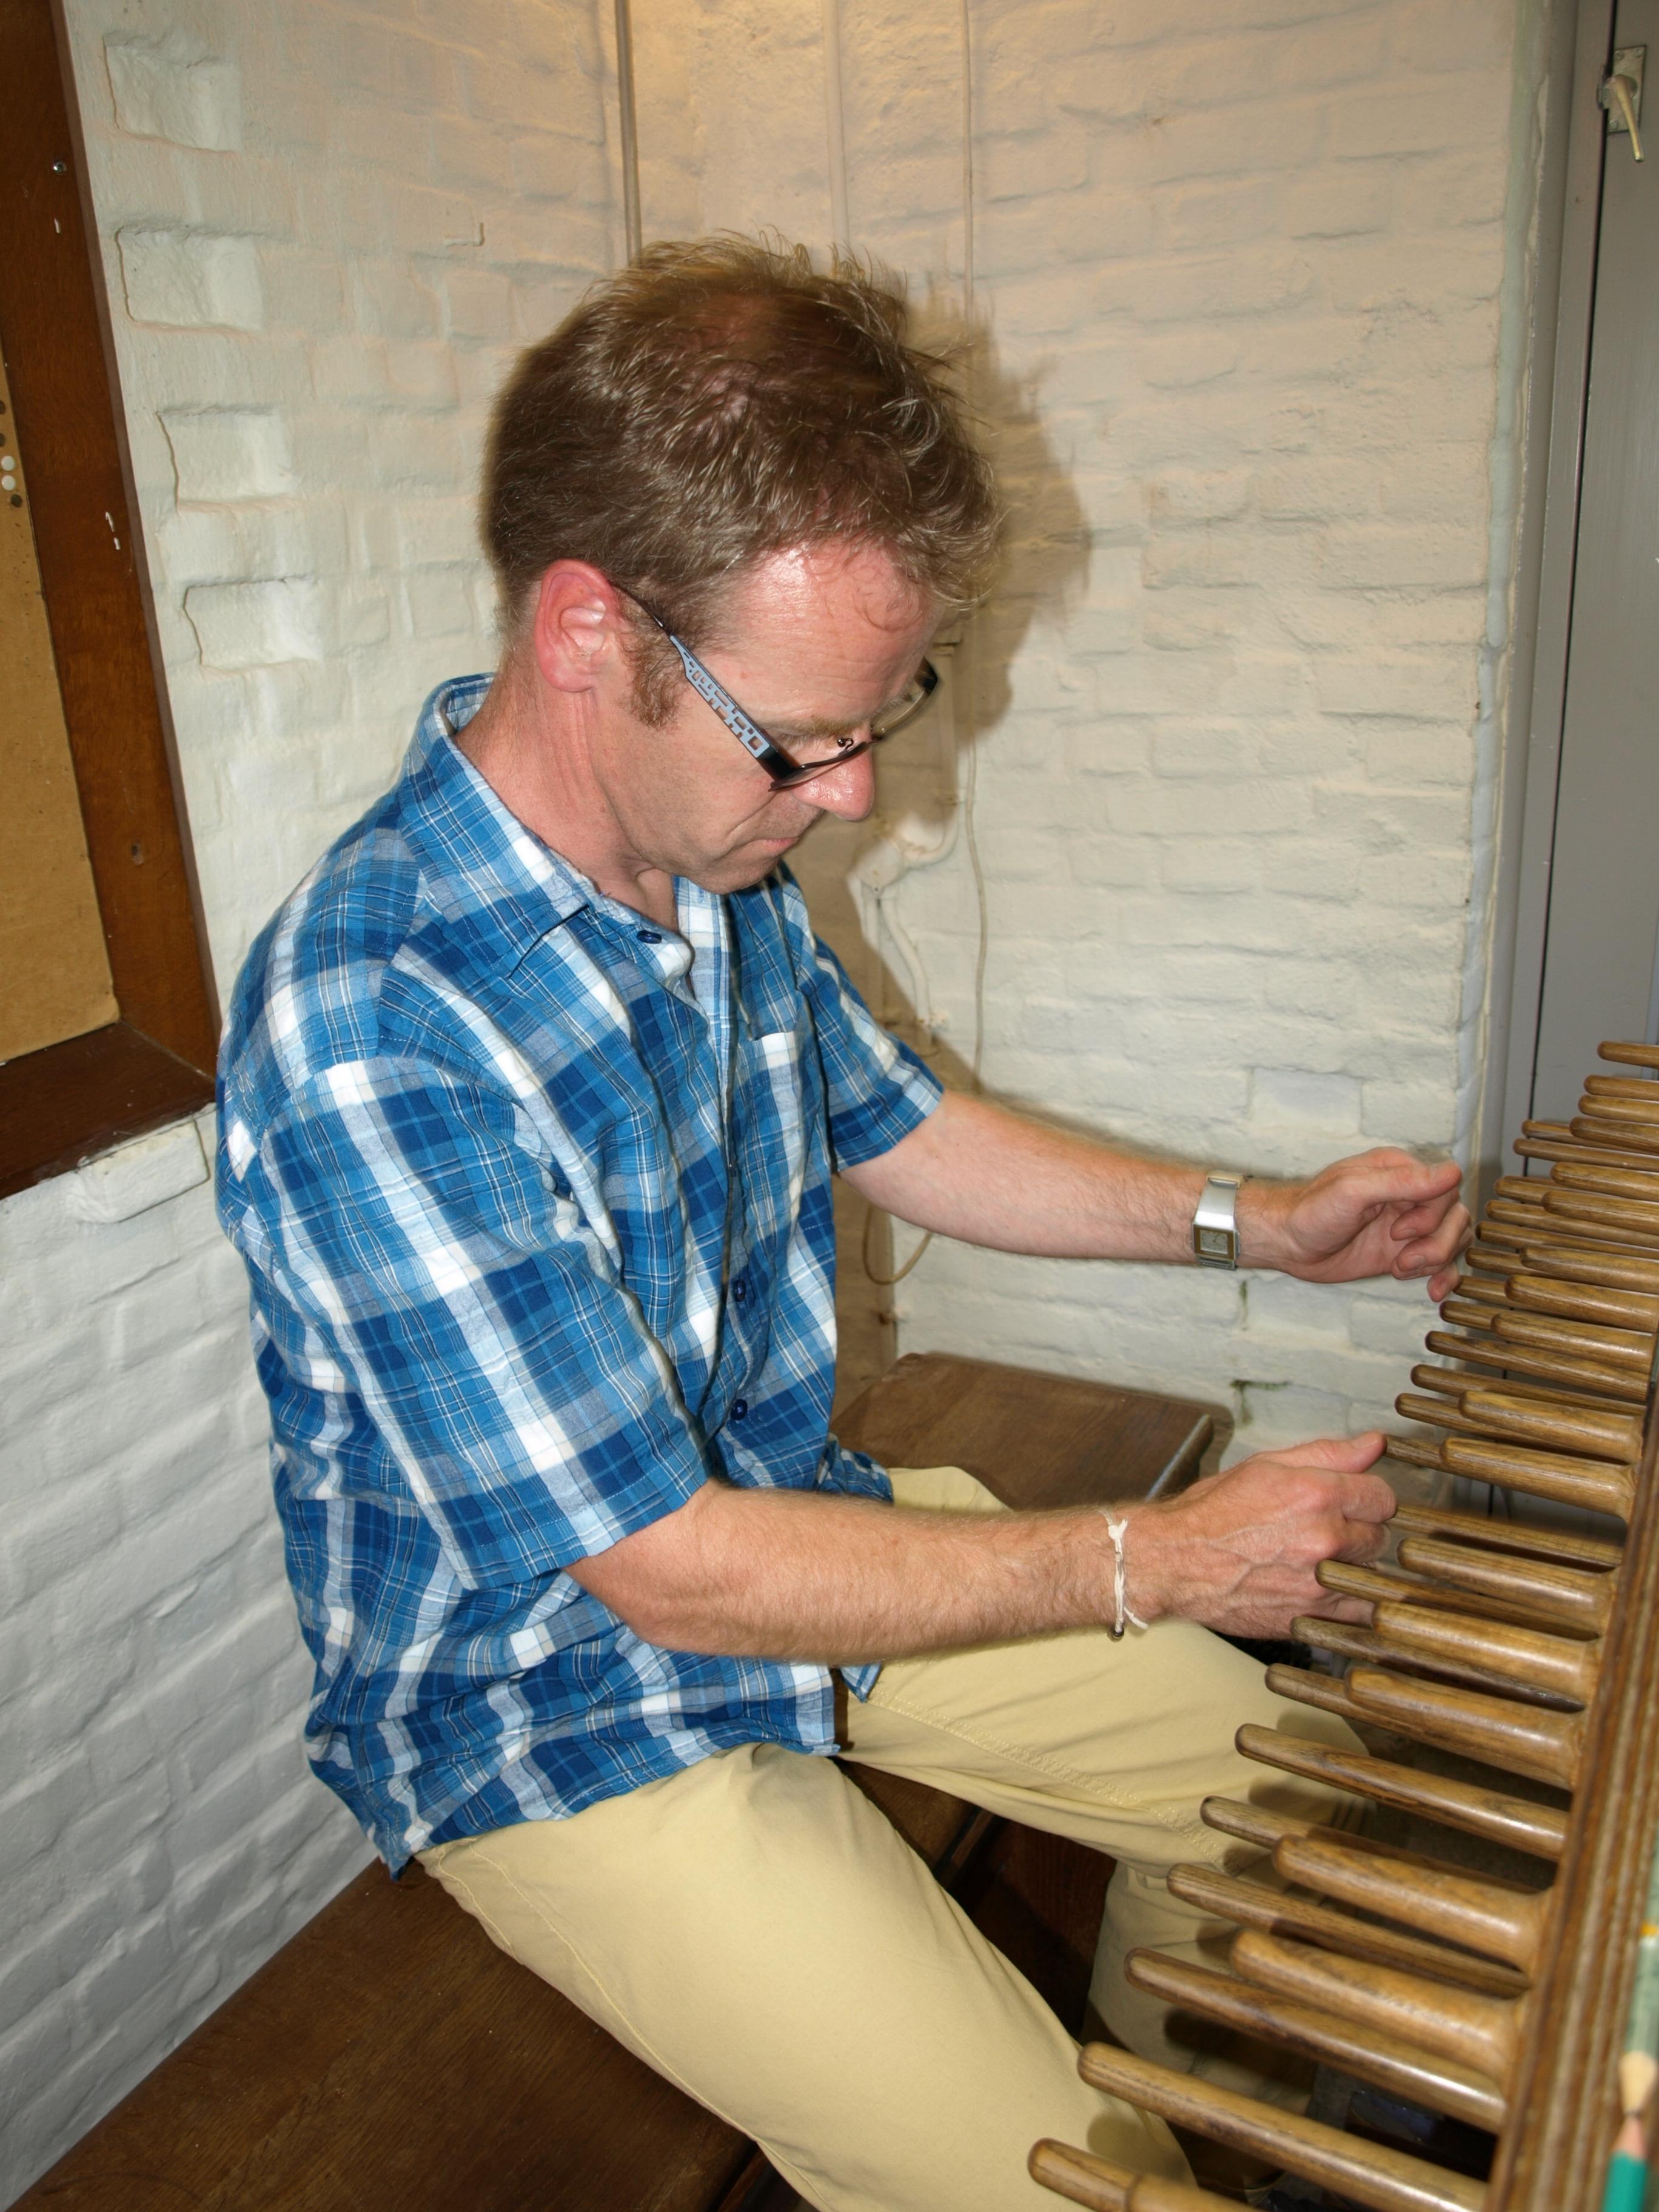 Wim Ruessink bespeelt het orgel van het Belgenmonument in Amersfoort